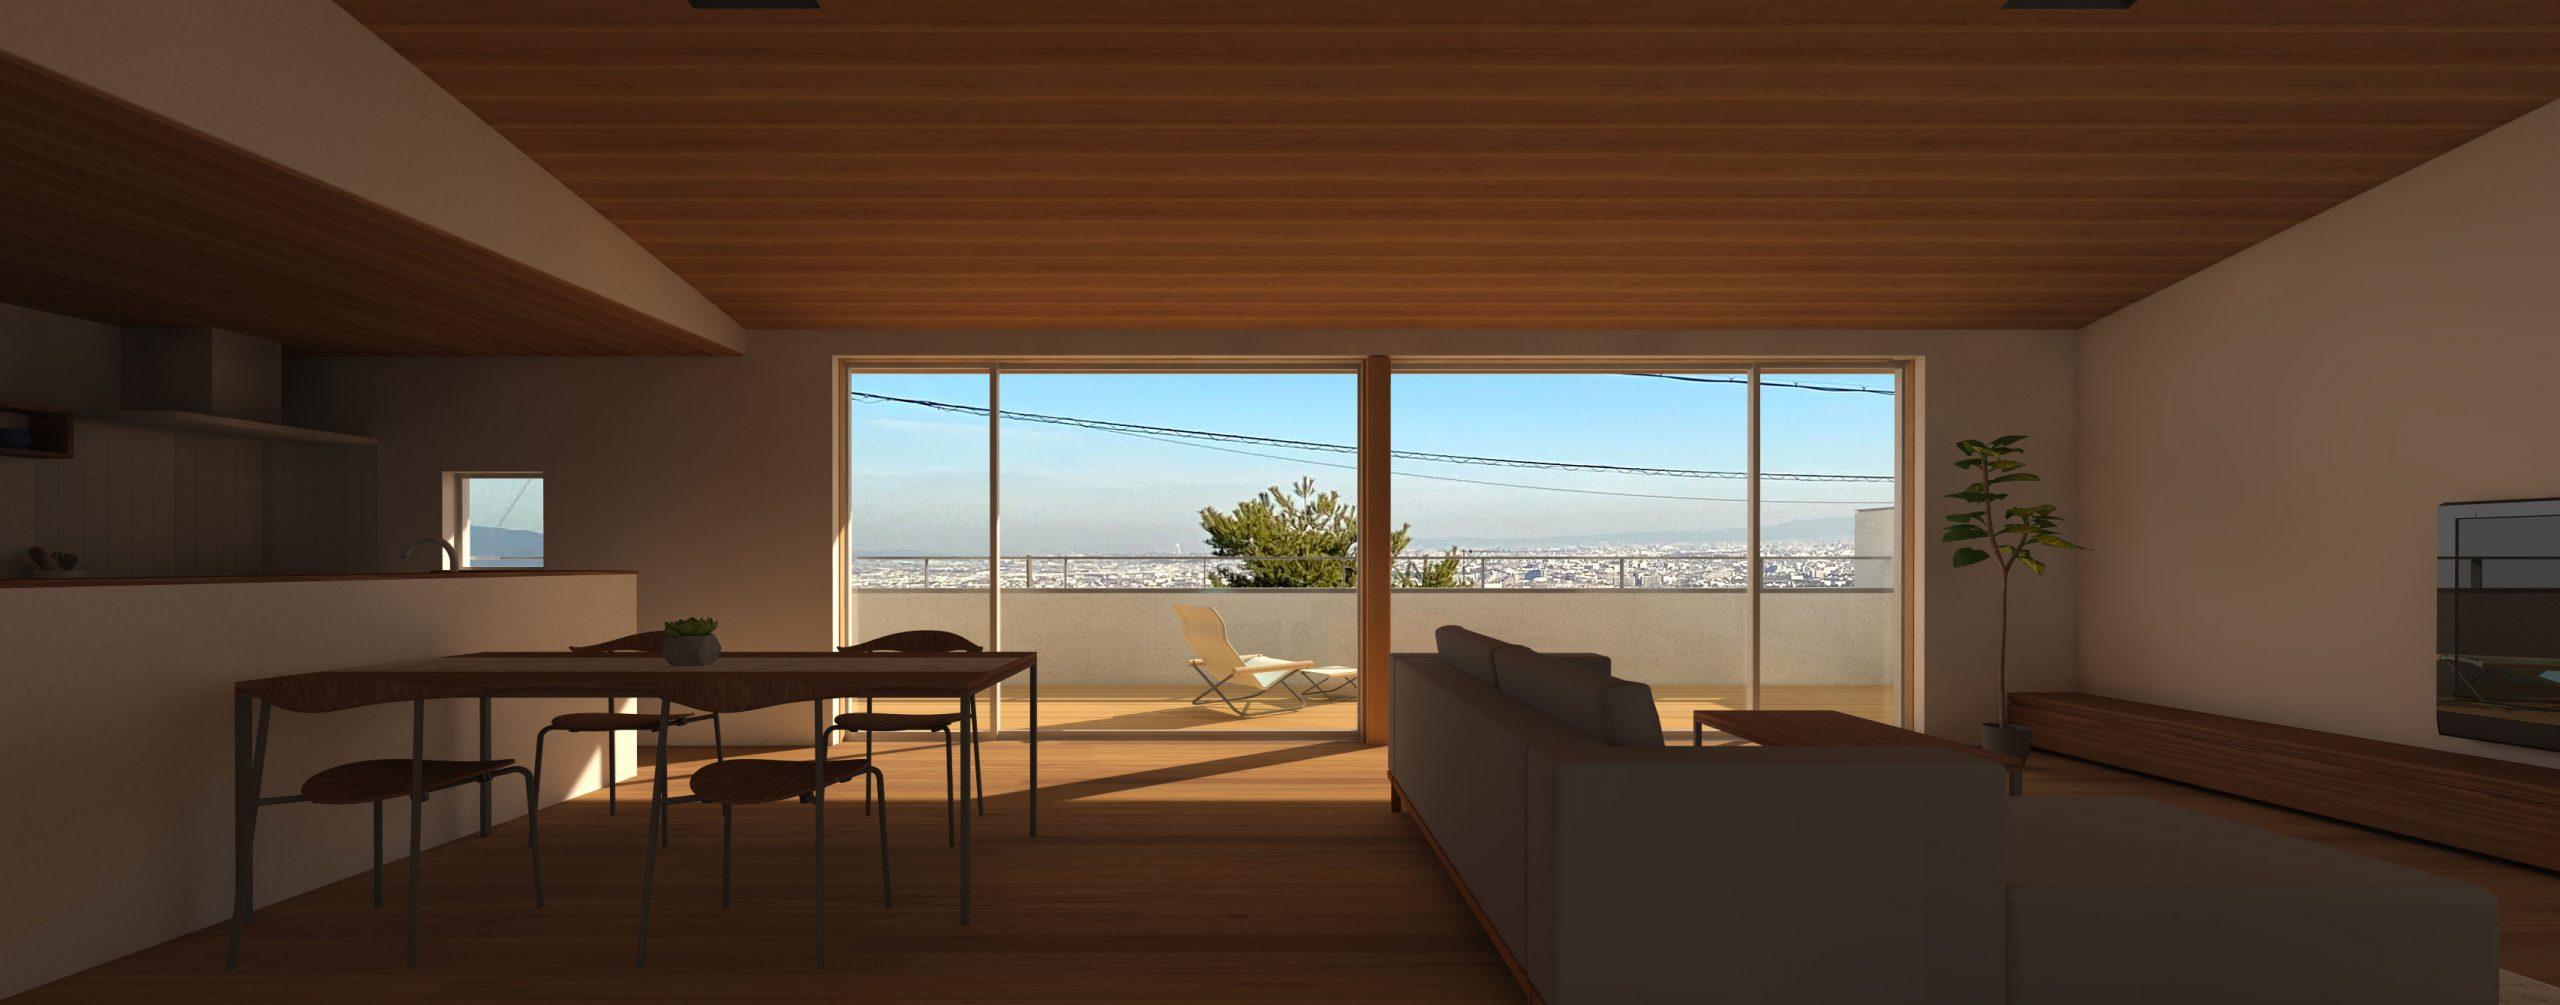 宝塚の家|atelier thu | 兵庫、神戸の建築設計事務所